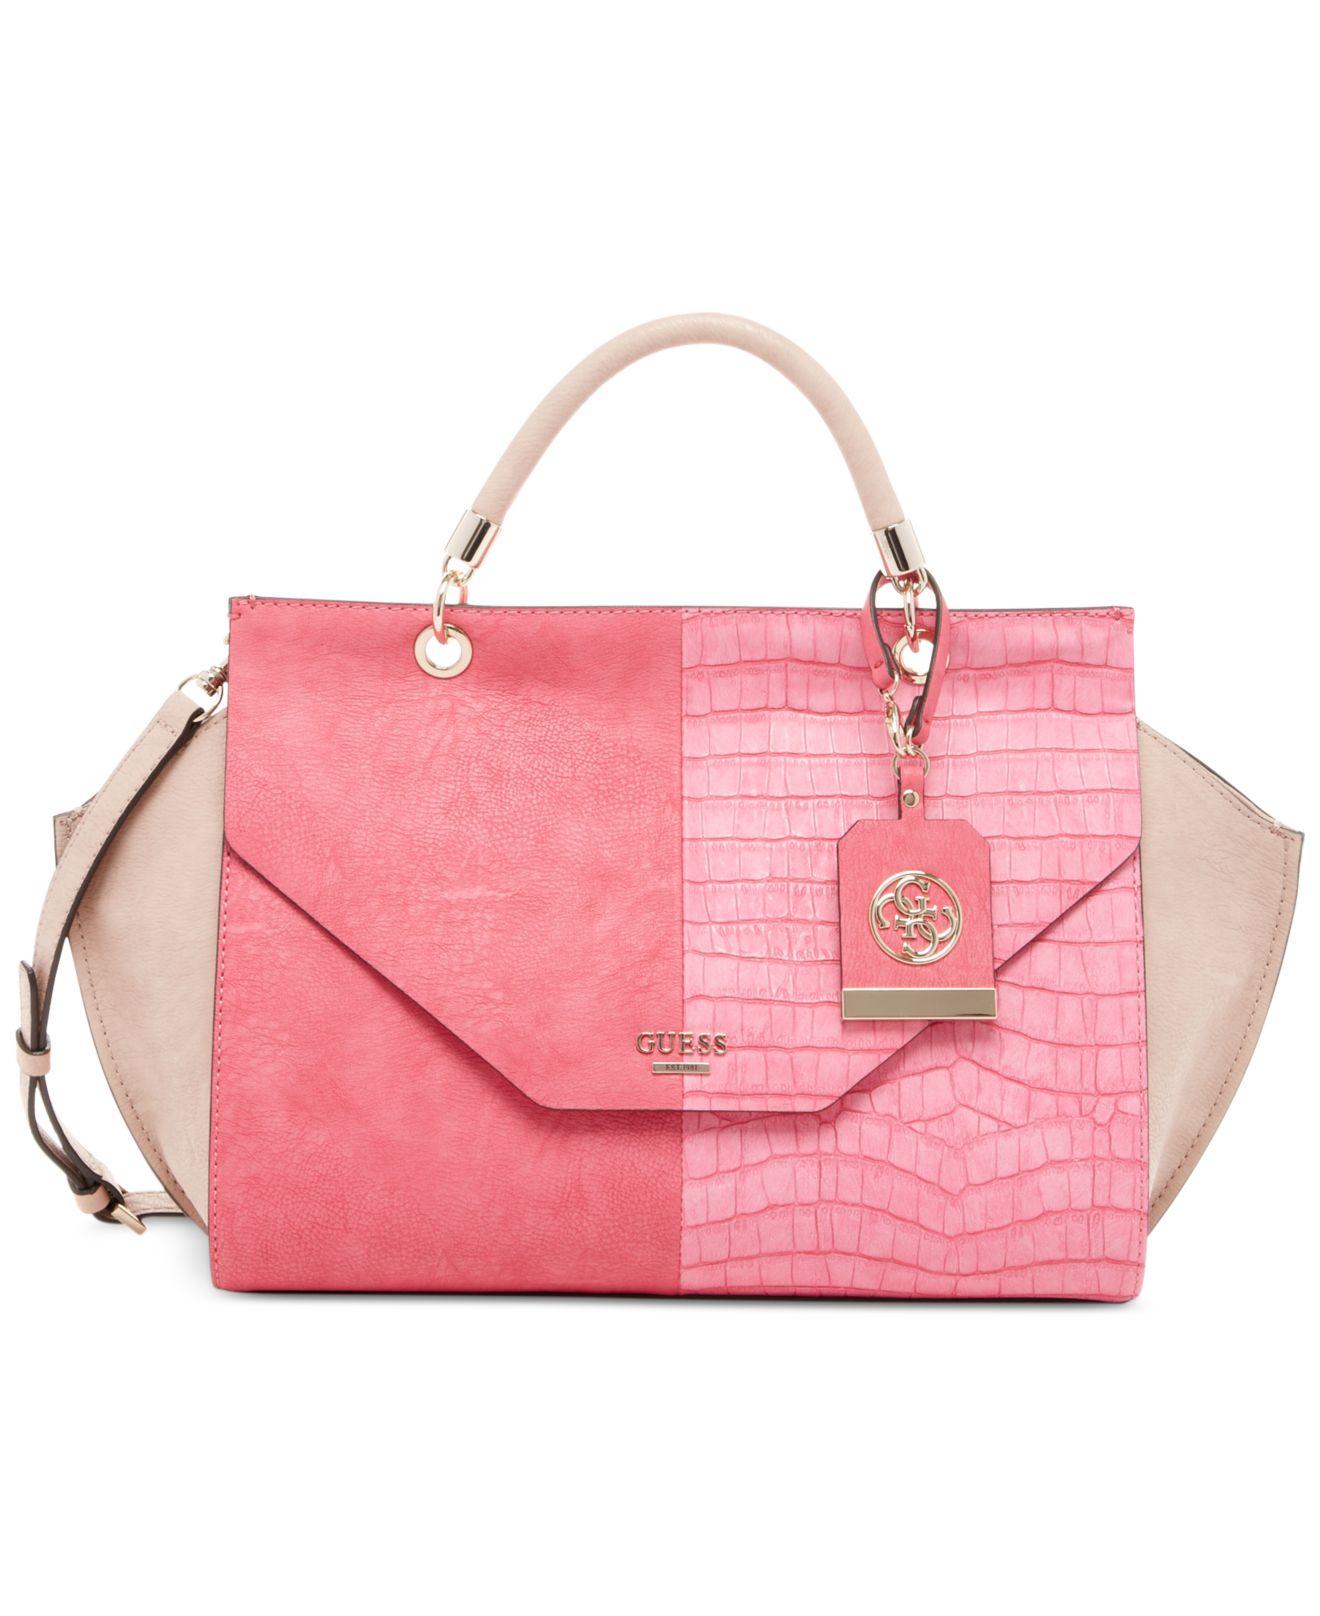 Lyst - Guess Casey Top Handle Flap Handbag in Pink 08fa81465f3b7